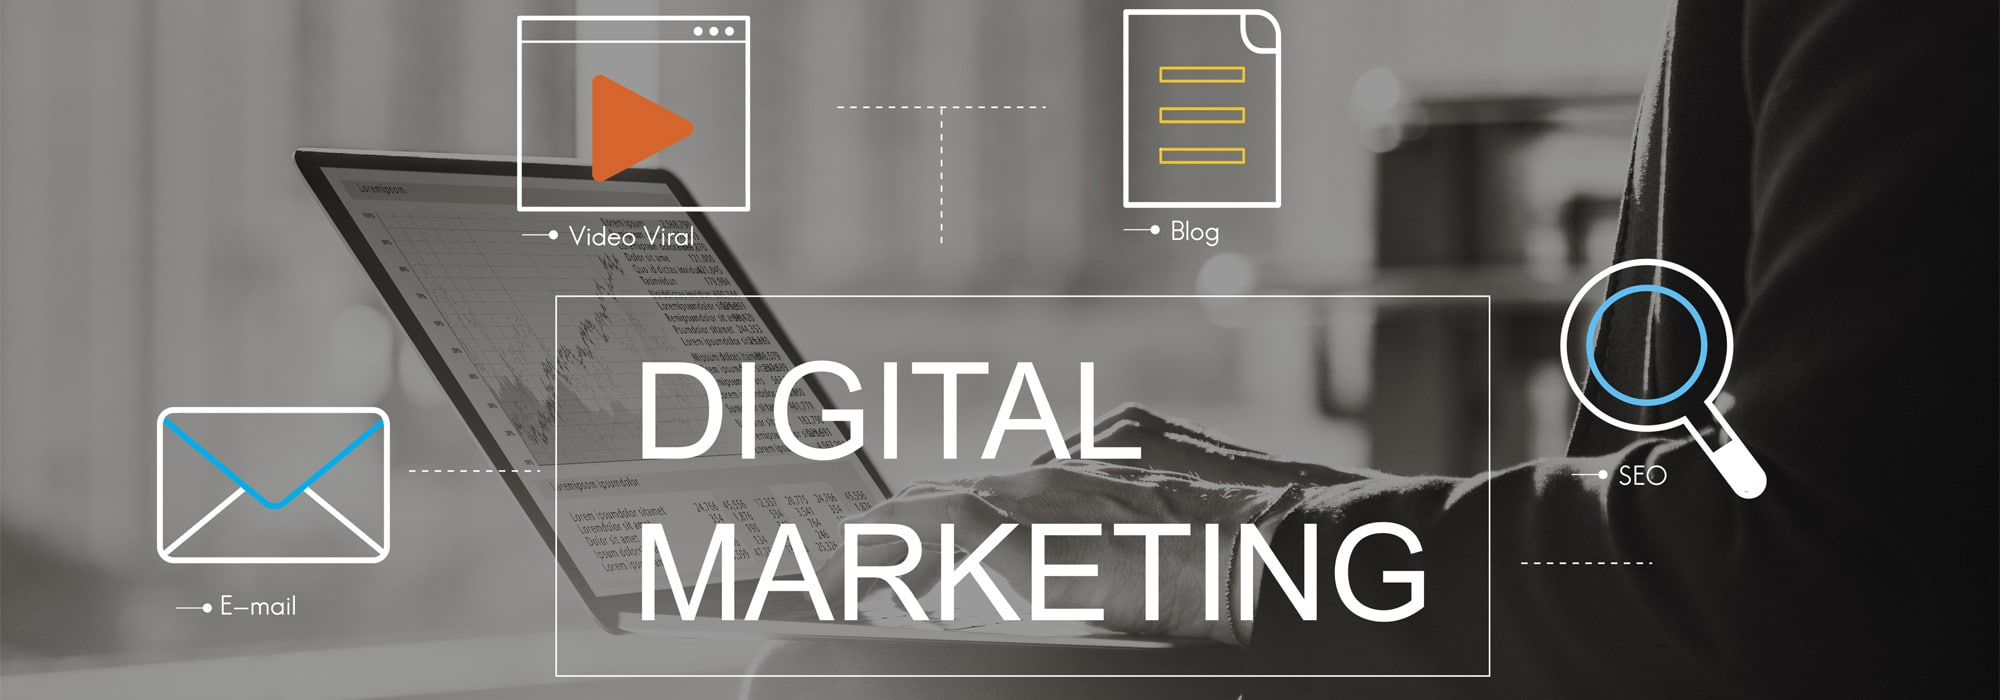 Internet Marketing Florence Township